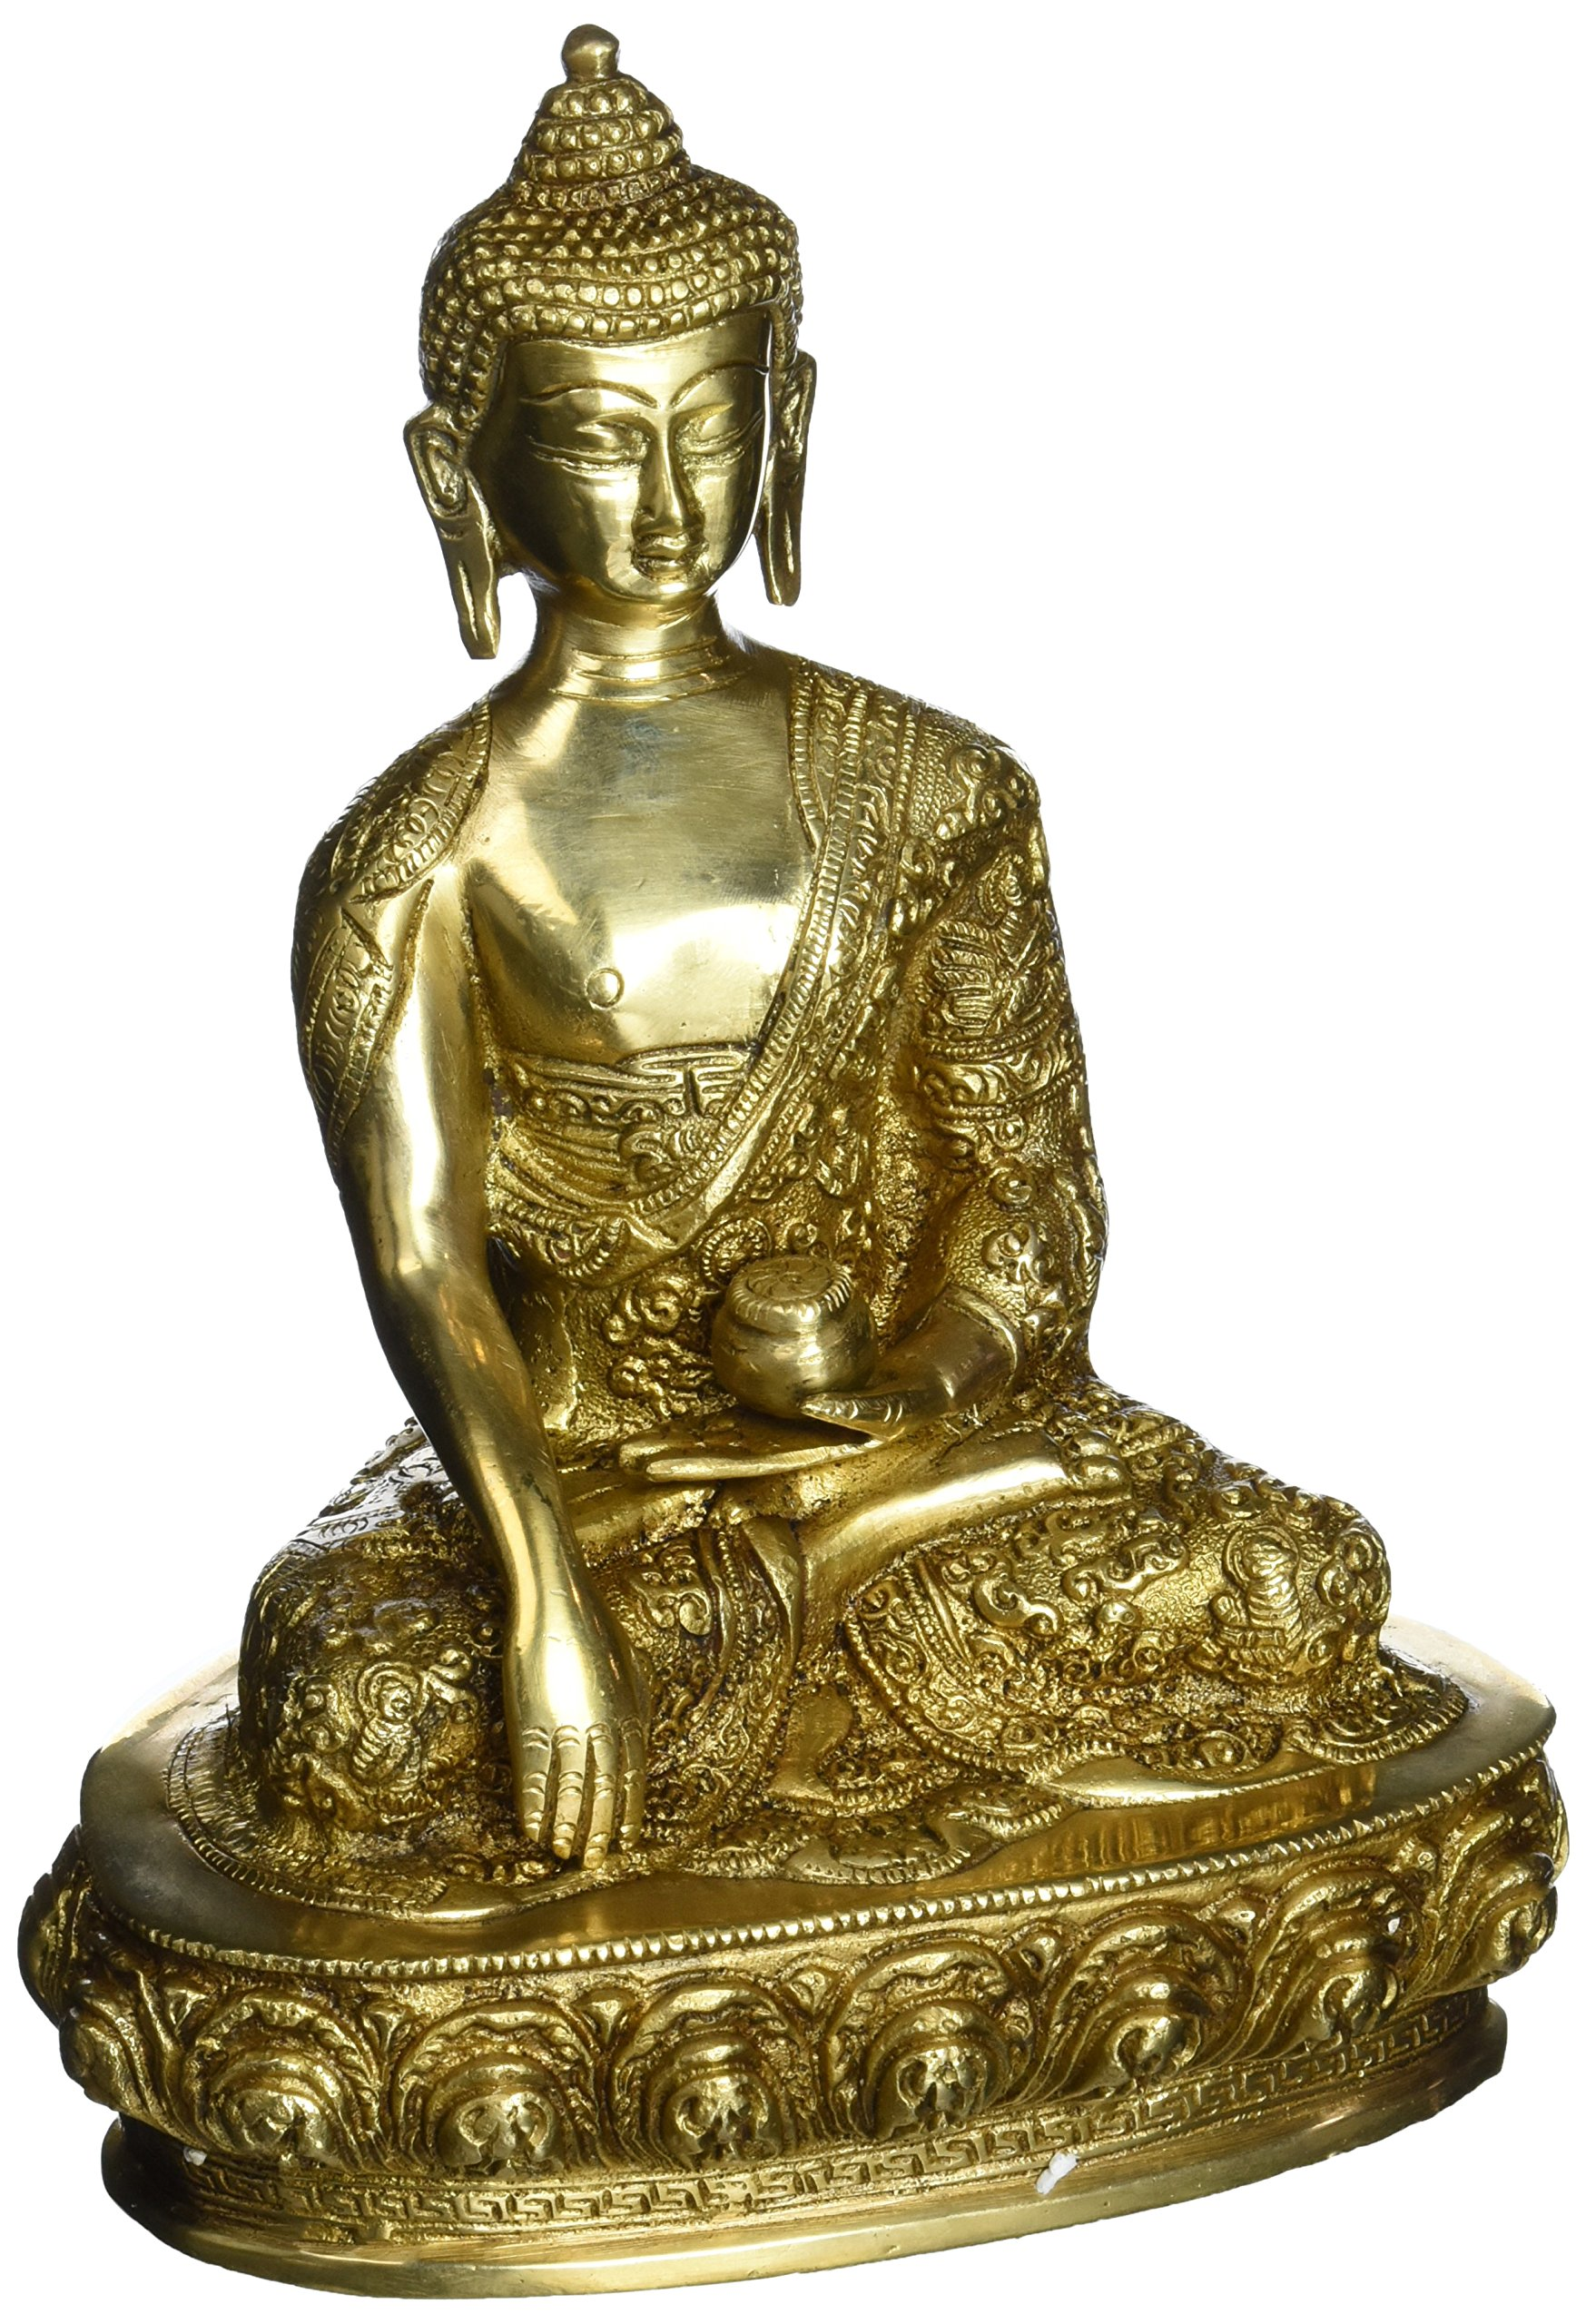 Indian Art Hindu Religious Statue Brass Handmade Sculpture of Lord Buddha 9 Inch 2.5 Kg